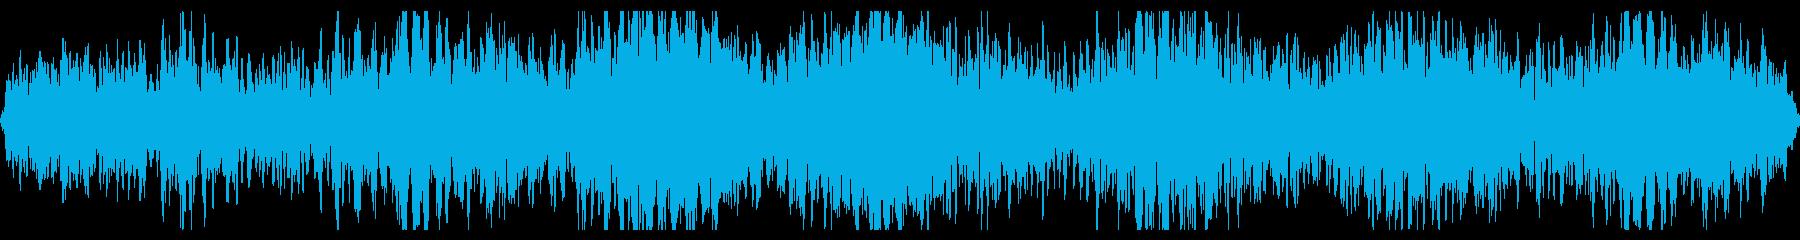 DARK PASSAGE、VERS...の再生済みの波形